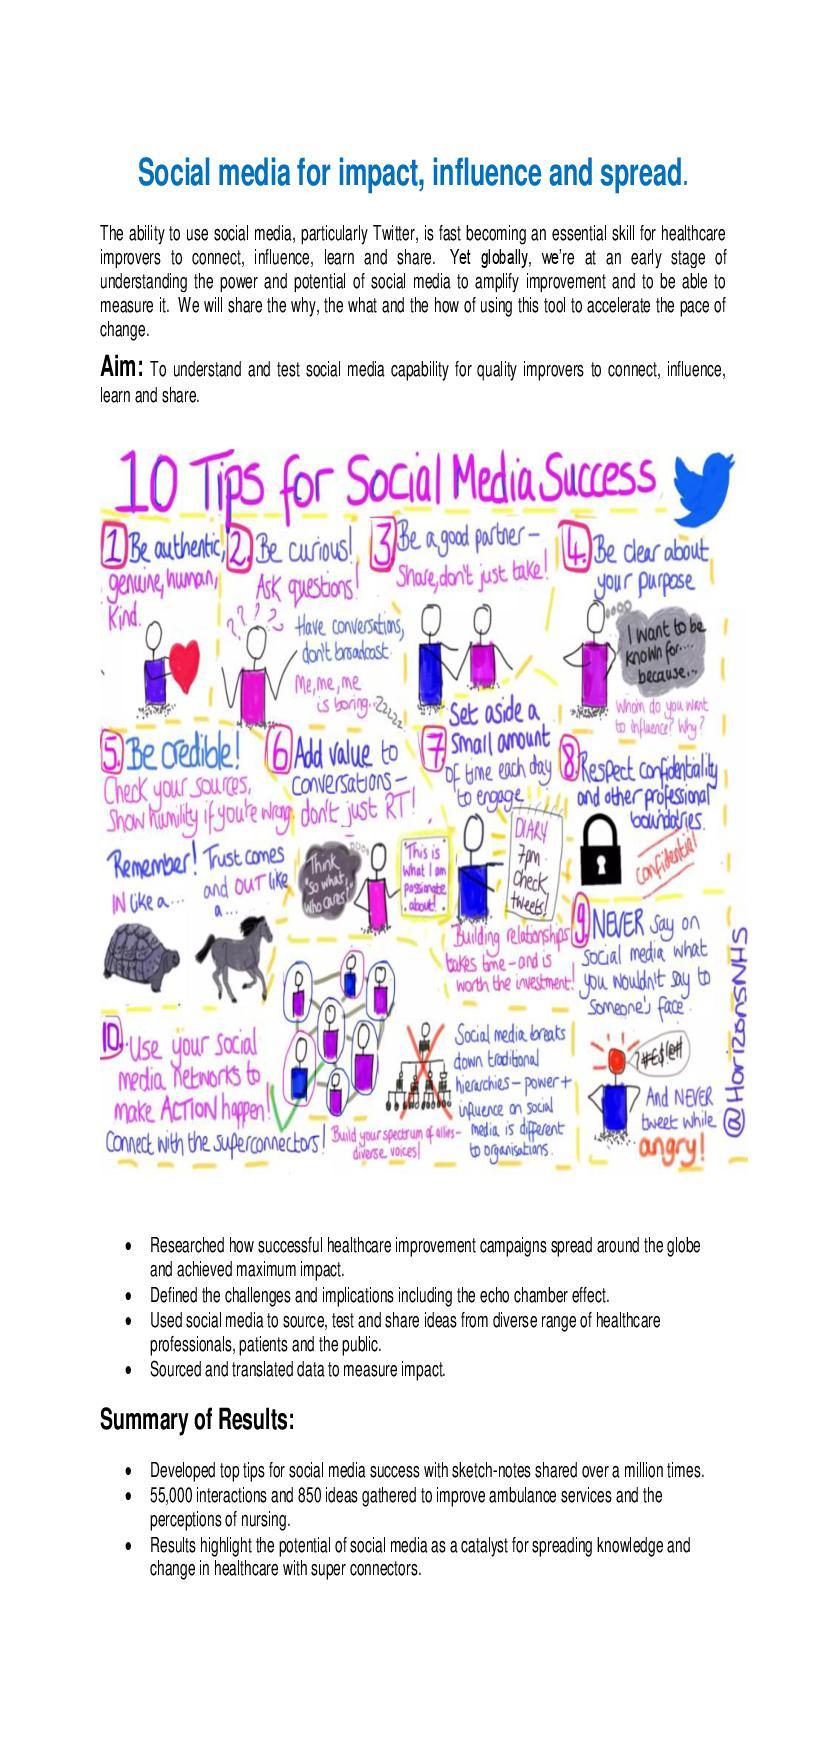 Storyboard social media for impact